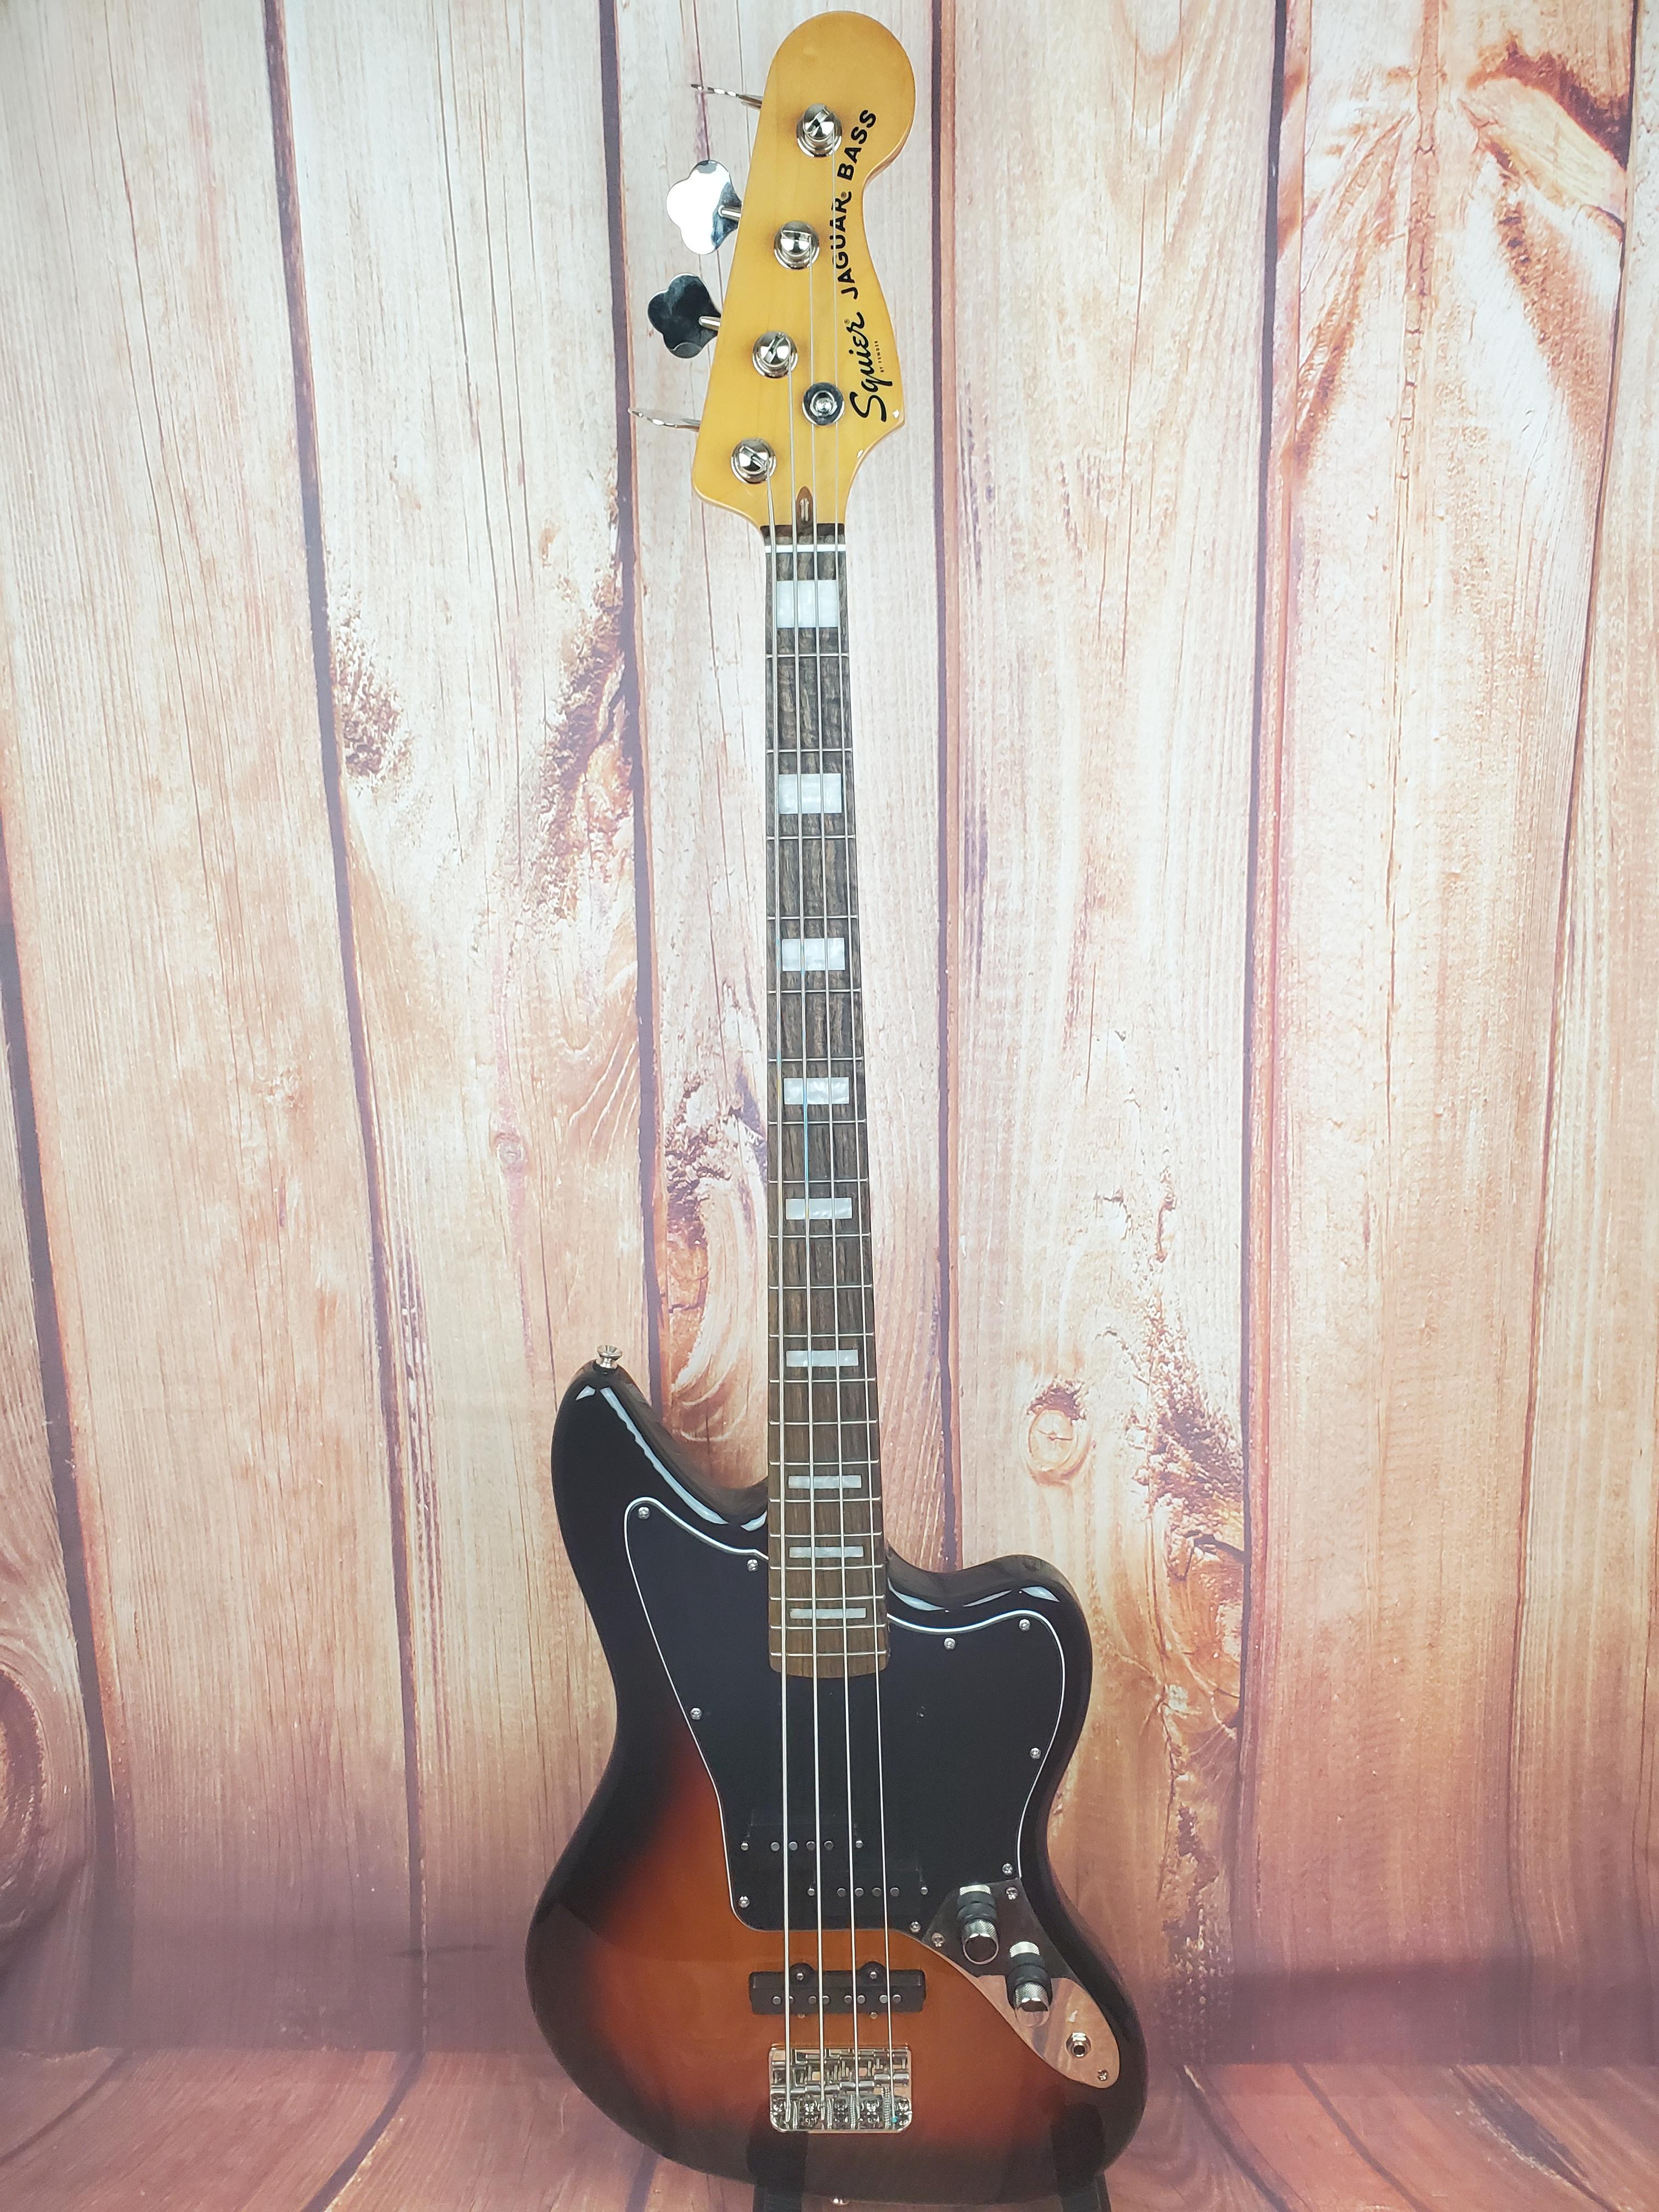 Used-Squier Classic Vibe Jaguar Bass